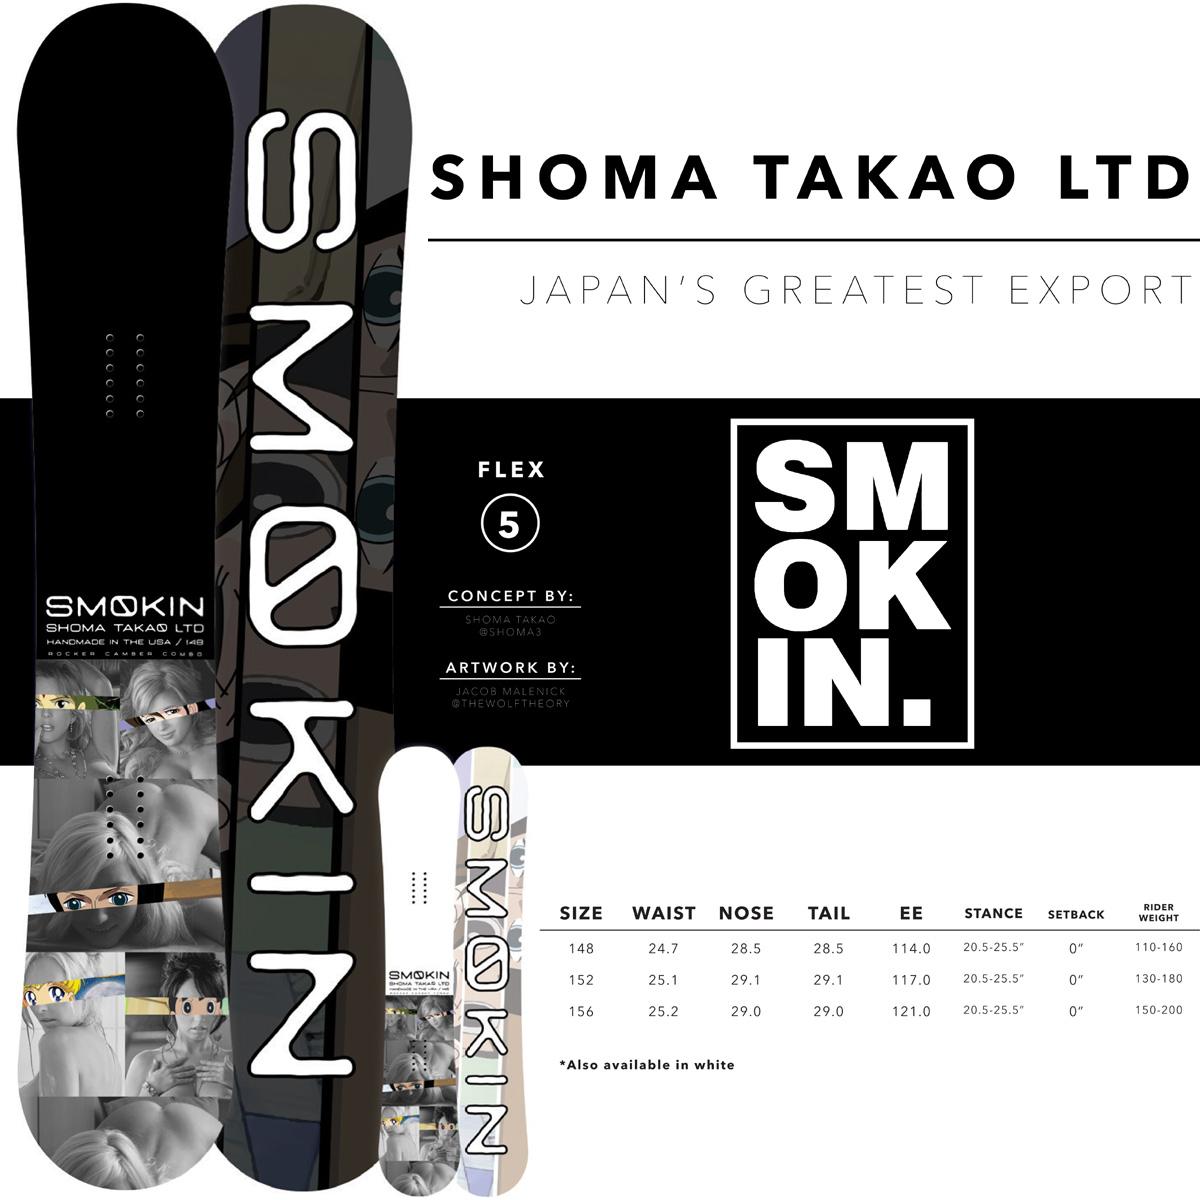 17-18 SMOKIN SHOMA TAKAO LTD/17-18 スモーキン ショウマ タカオ LTD/SMOKIN スノーボード/スモーキン スノーボード/SMOKIN/148/152/高尾翔馬 シグネチャーモデル/SHOMA TAKAO PRO MODEL/2017-2018